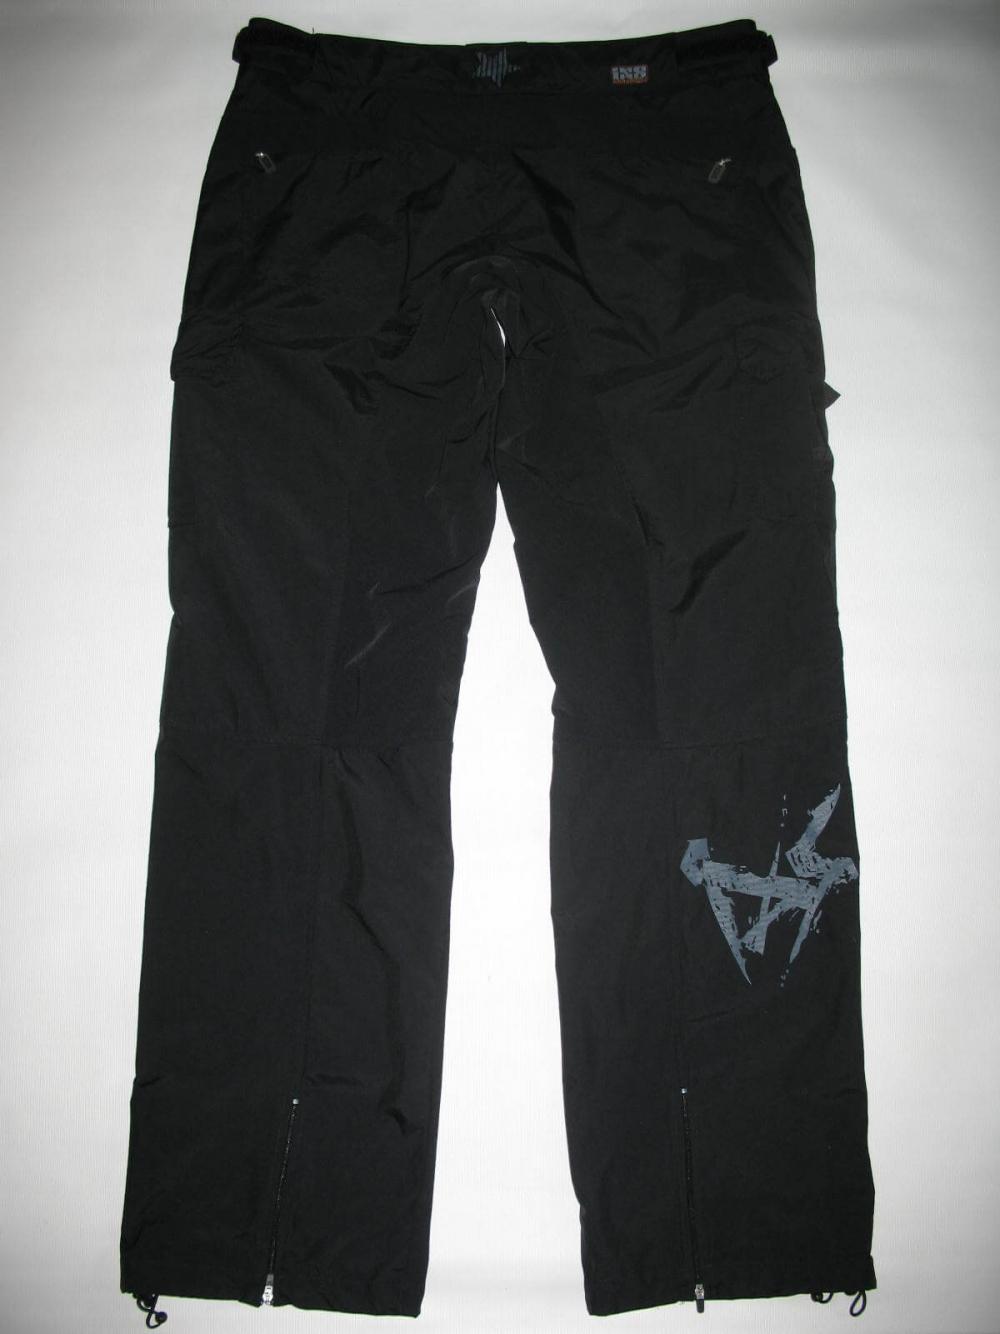 Штаны IXS bc-elite hurtle bike pants (размер XL) - 2